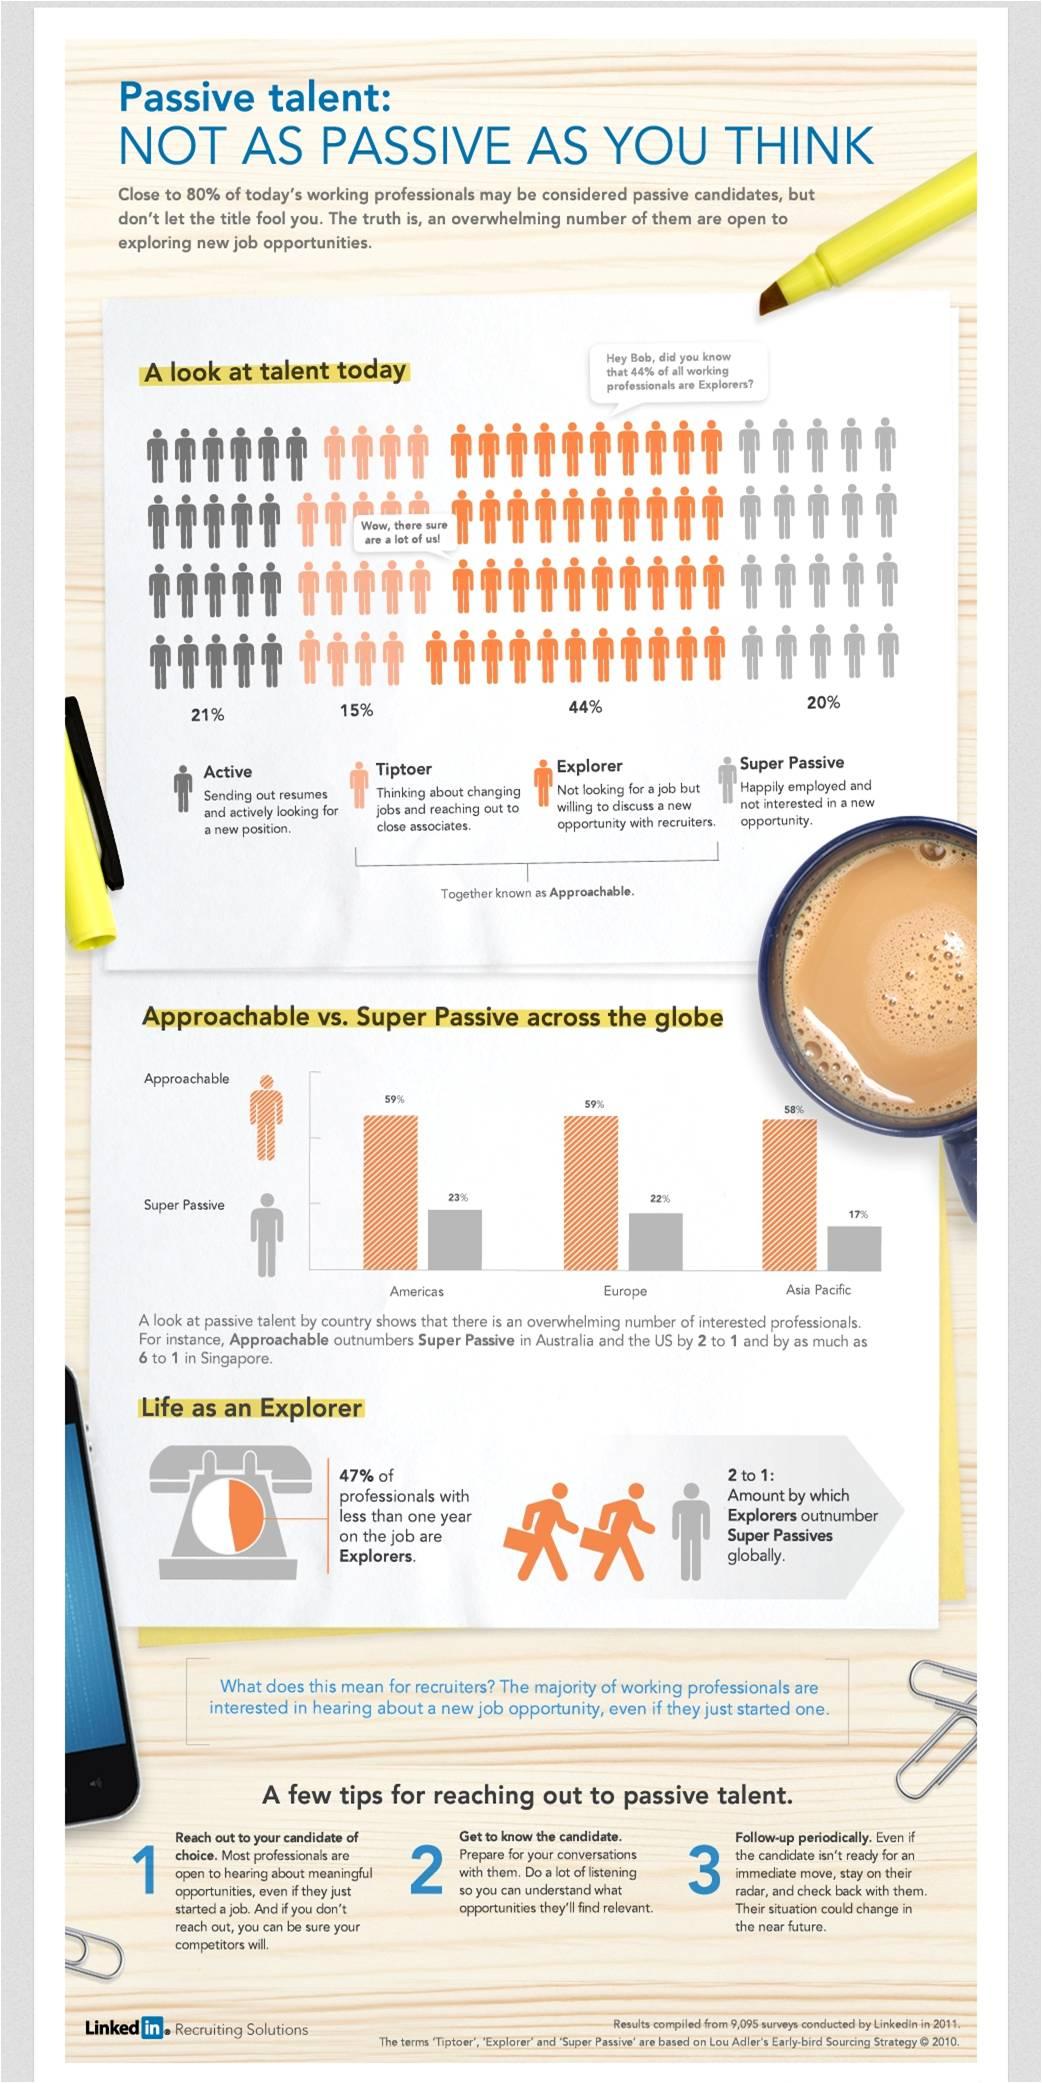 linkedin_passive_talent_infographic_en_us_130703